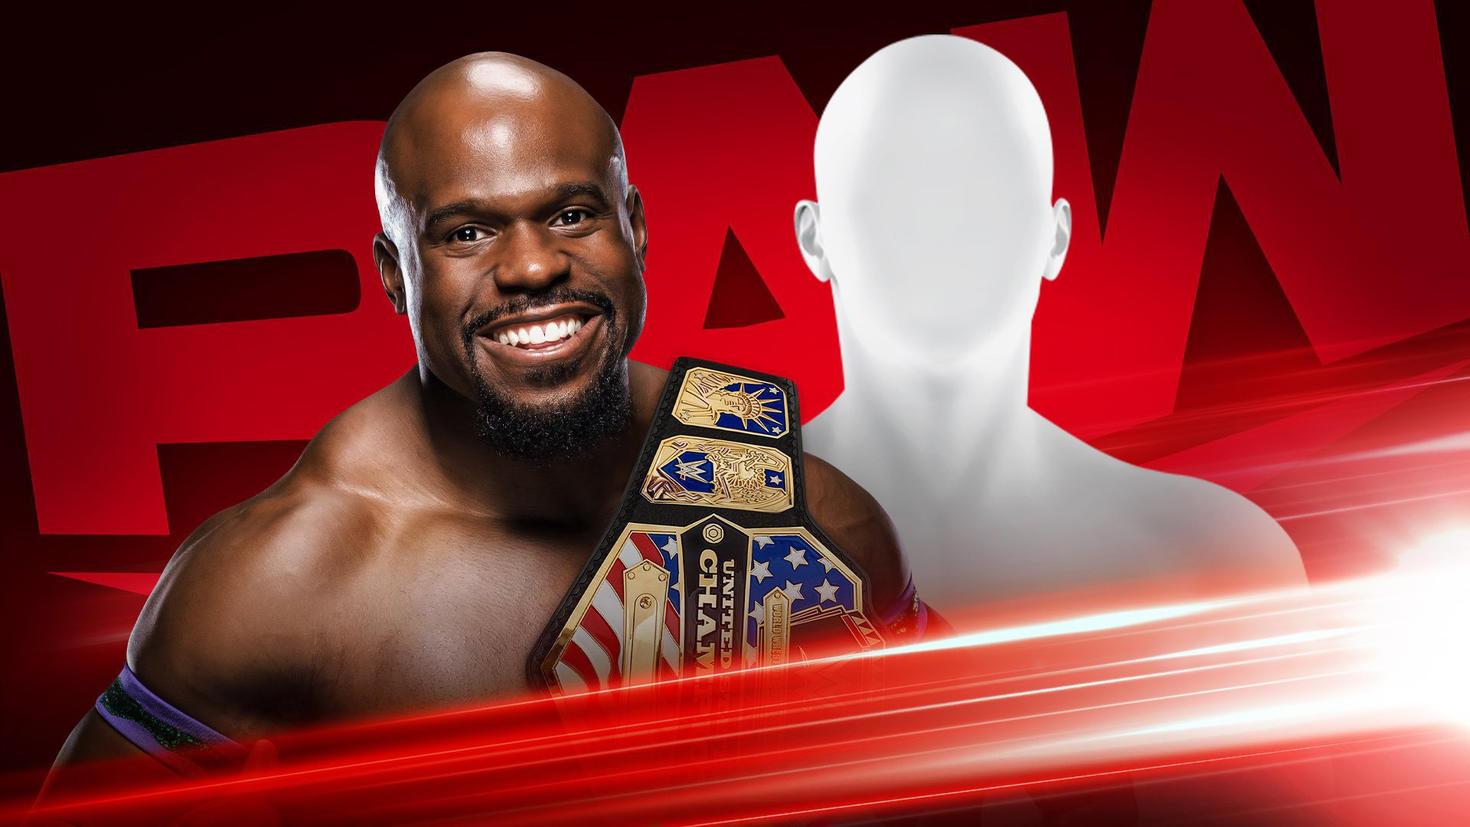 WWE Raw Preview (01/06/20): Rey Mysterio Retirement; Champion Vs Champion 3